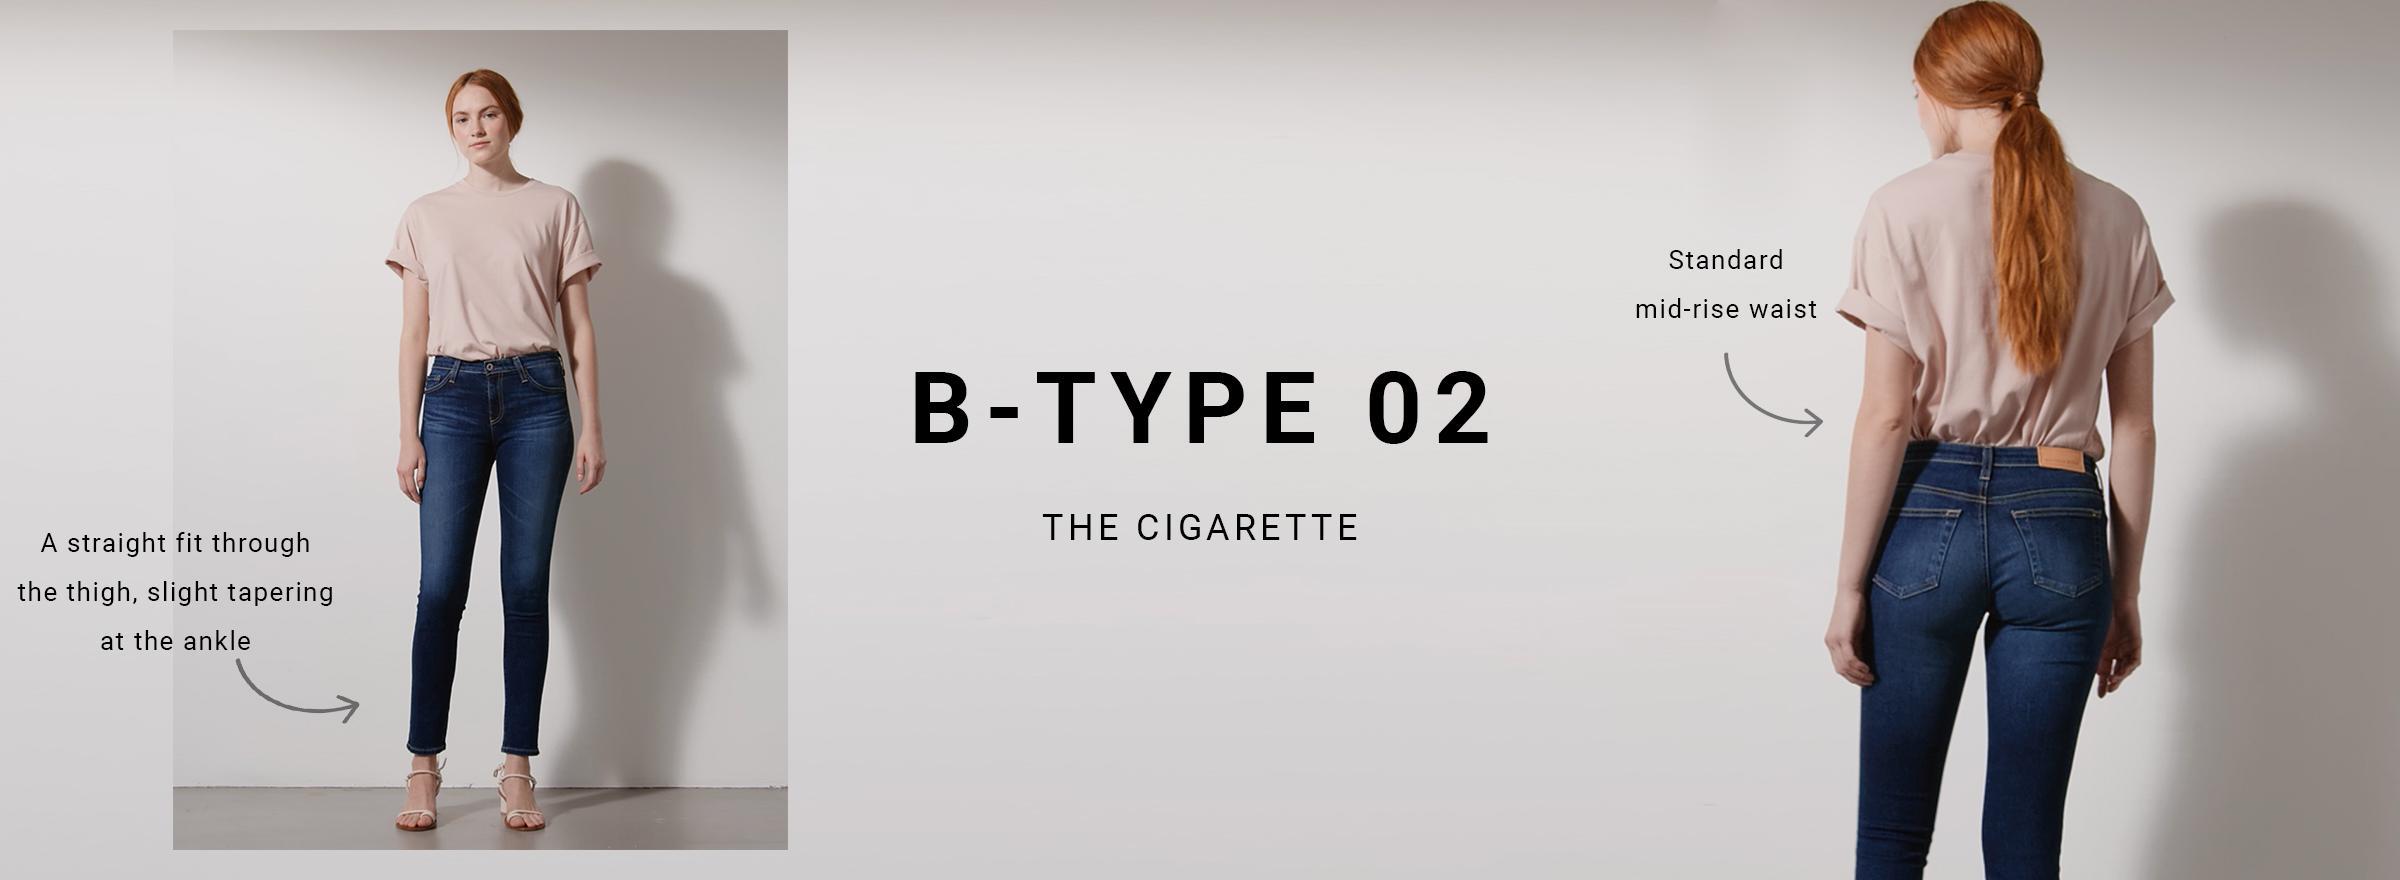 Shop B-Type 02 Womens Cigarette Jeans on Big Star Denim